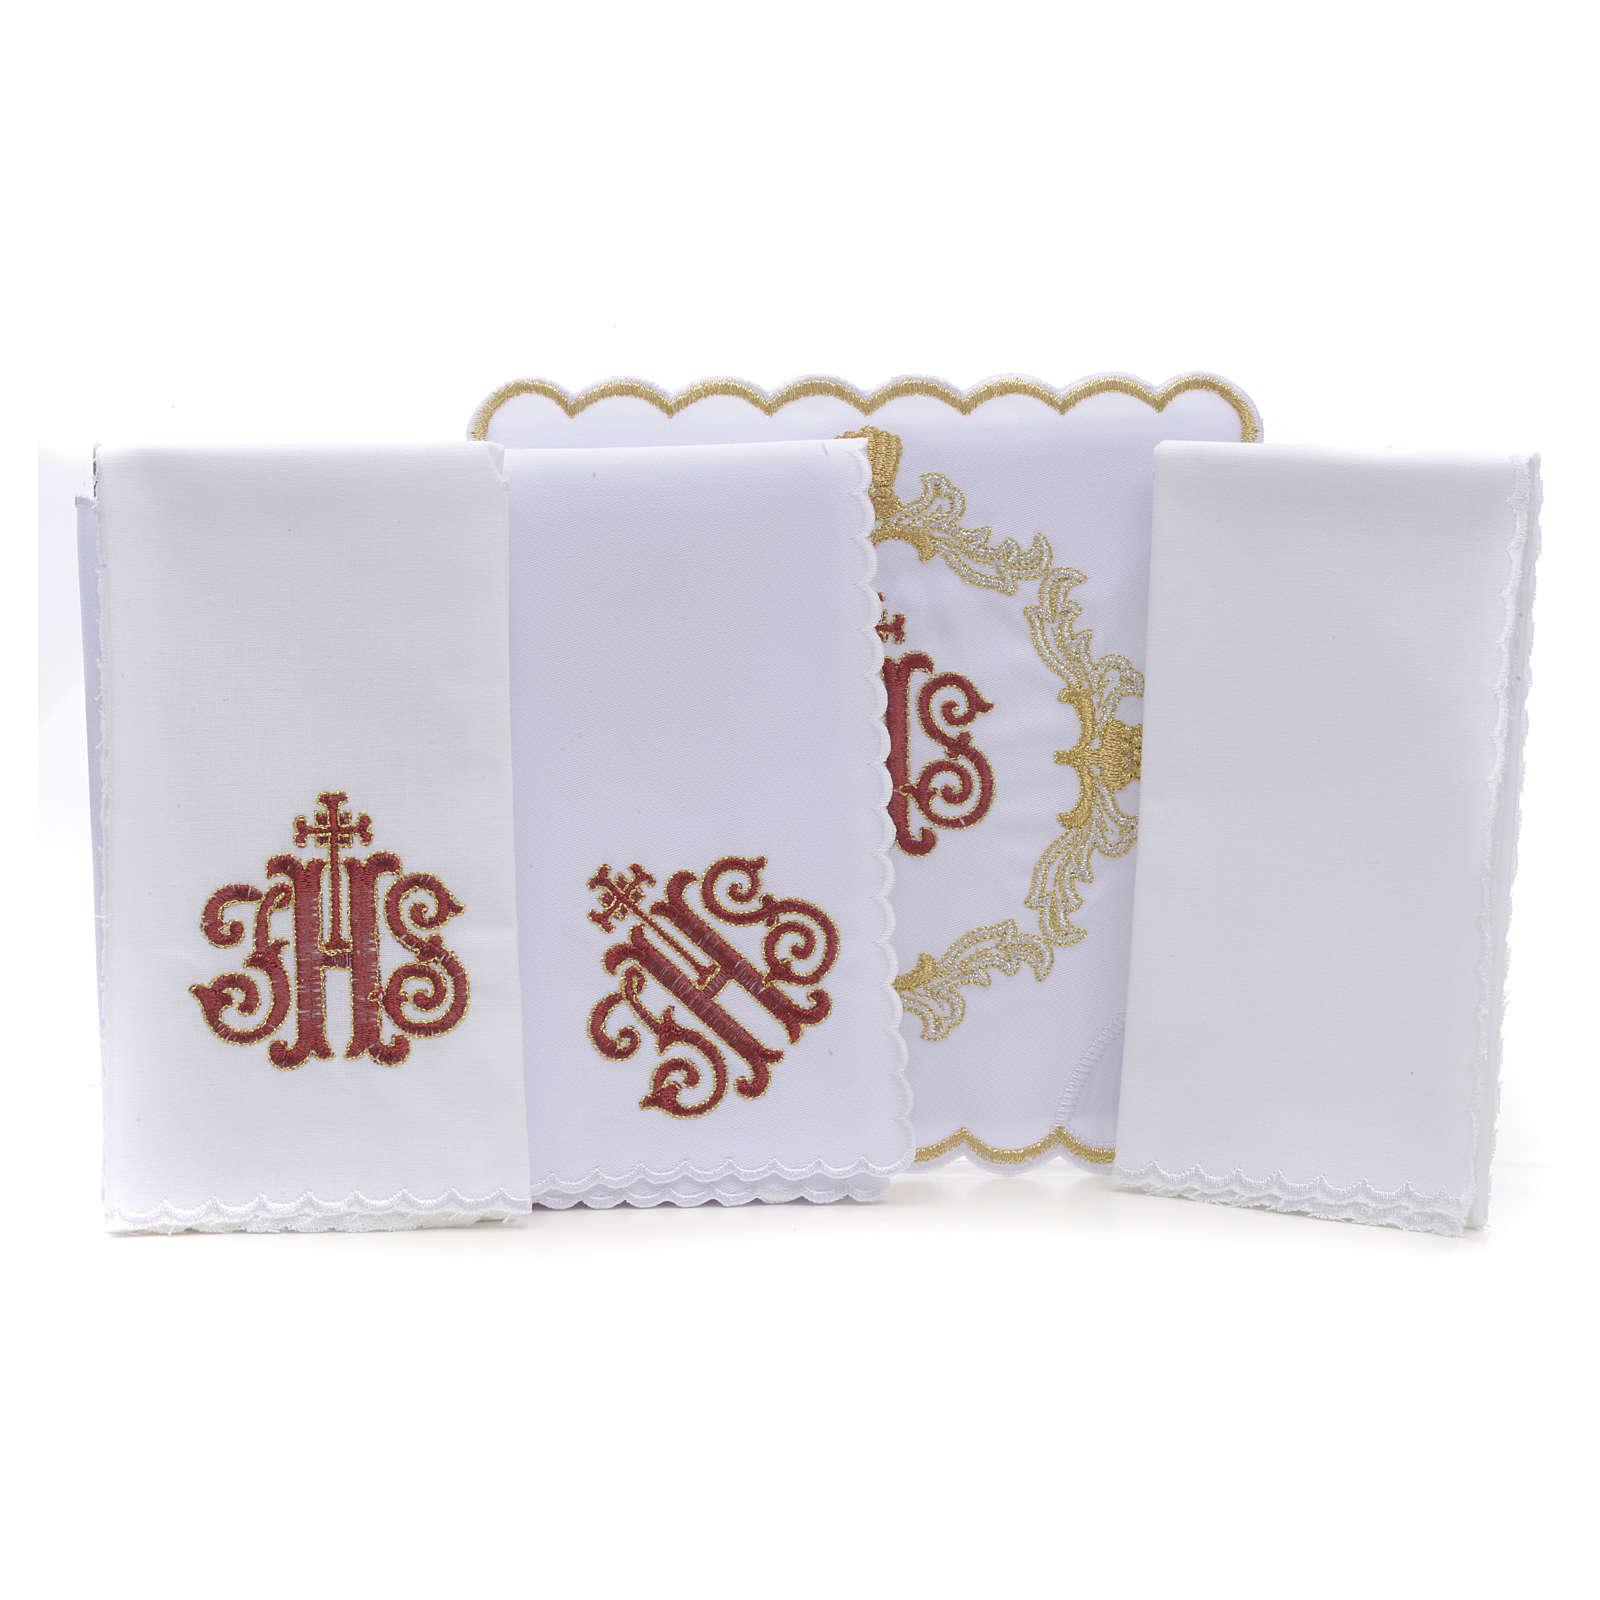 Altar linens, set of 4, 100% linen, blue Marian symbol 4